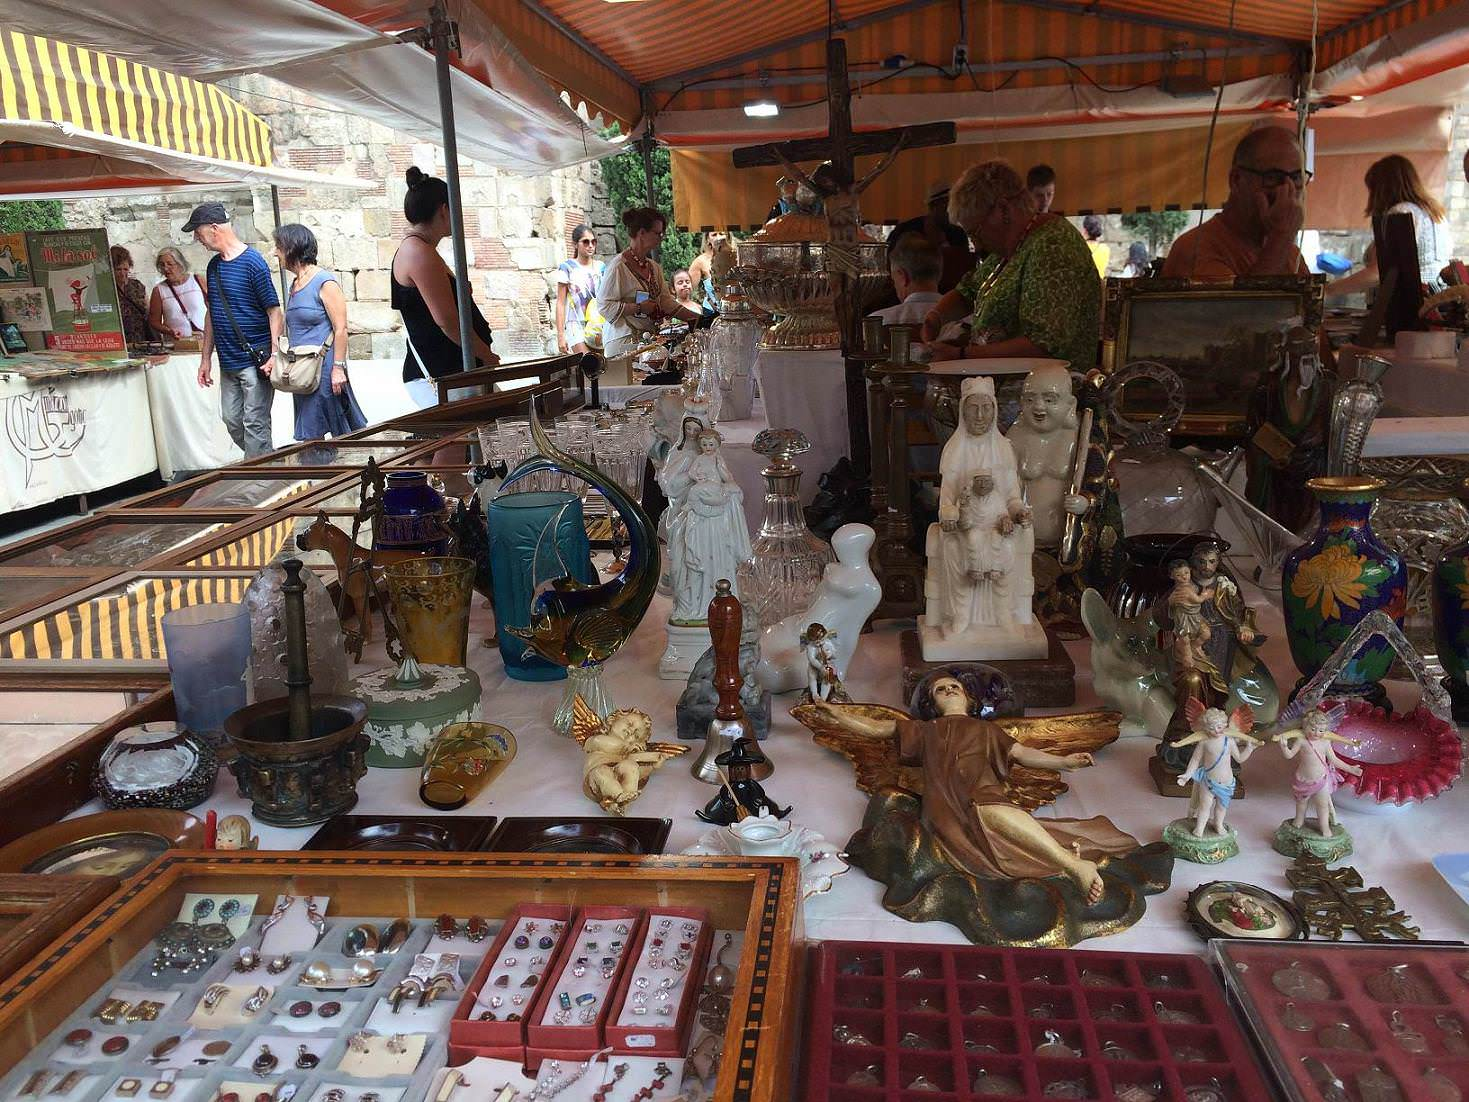 Mercadillo de antig edades de la catedral un buen d a en - Mercado antiguedades barcelona ...